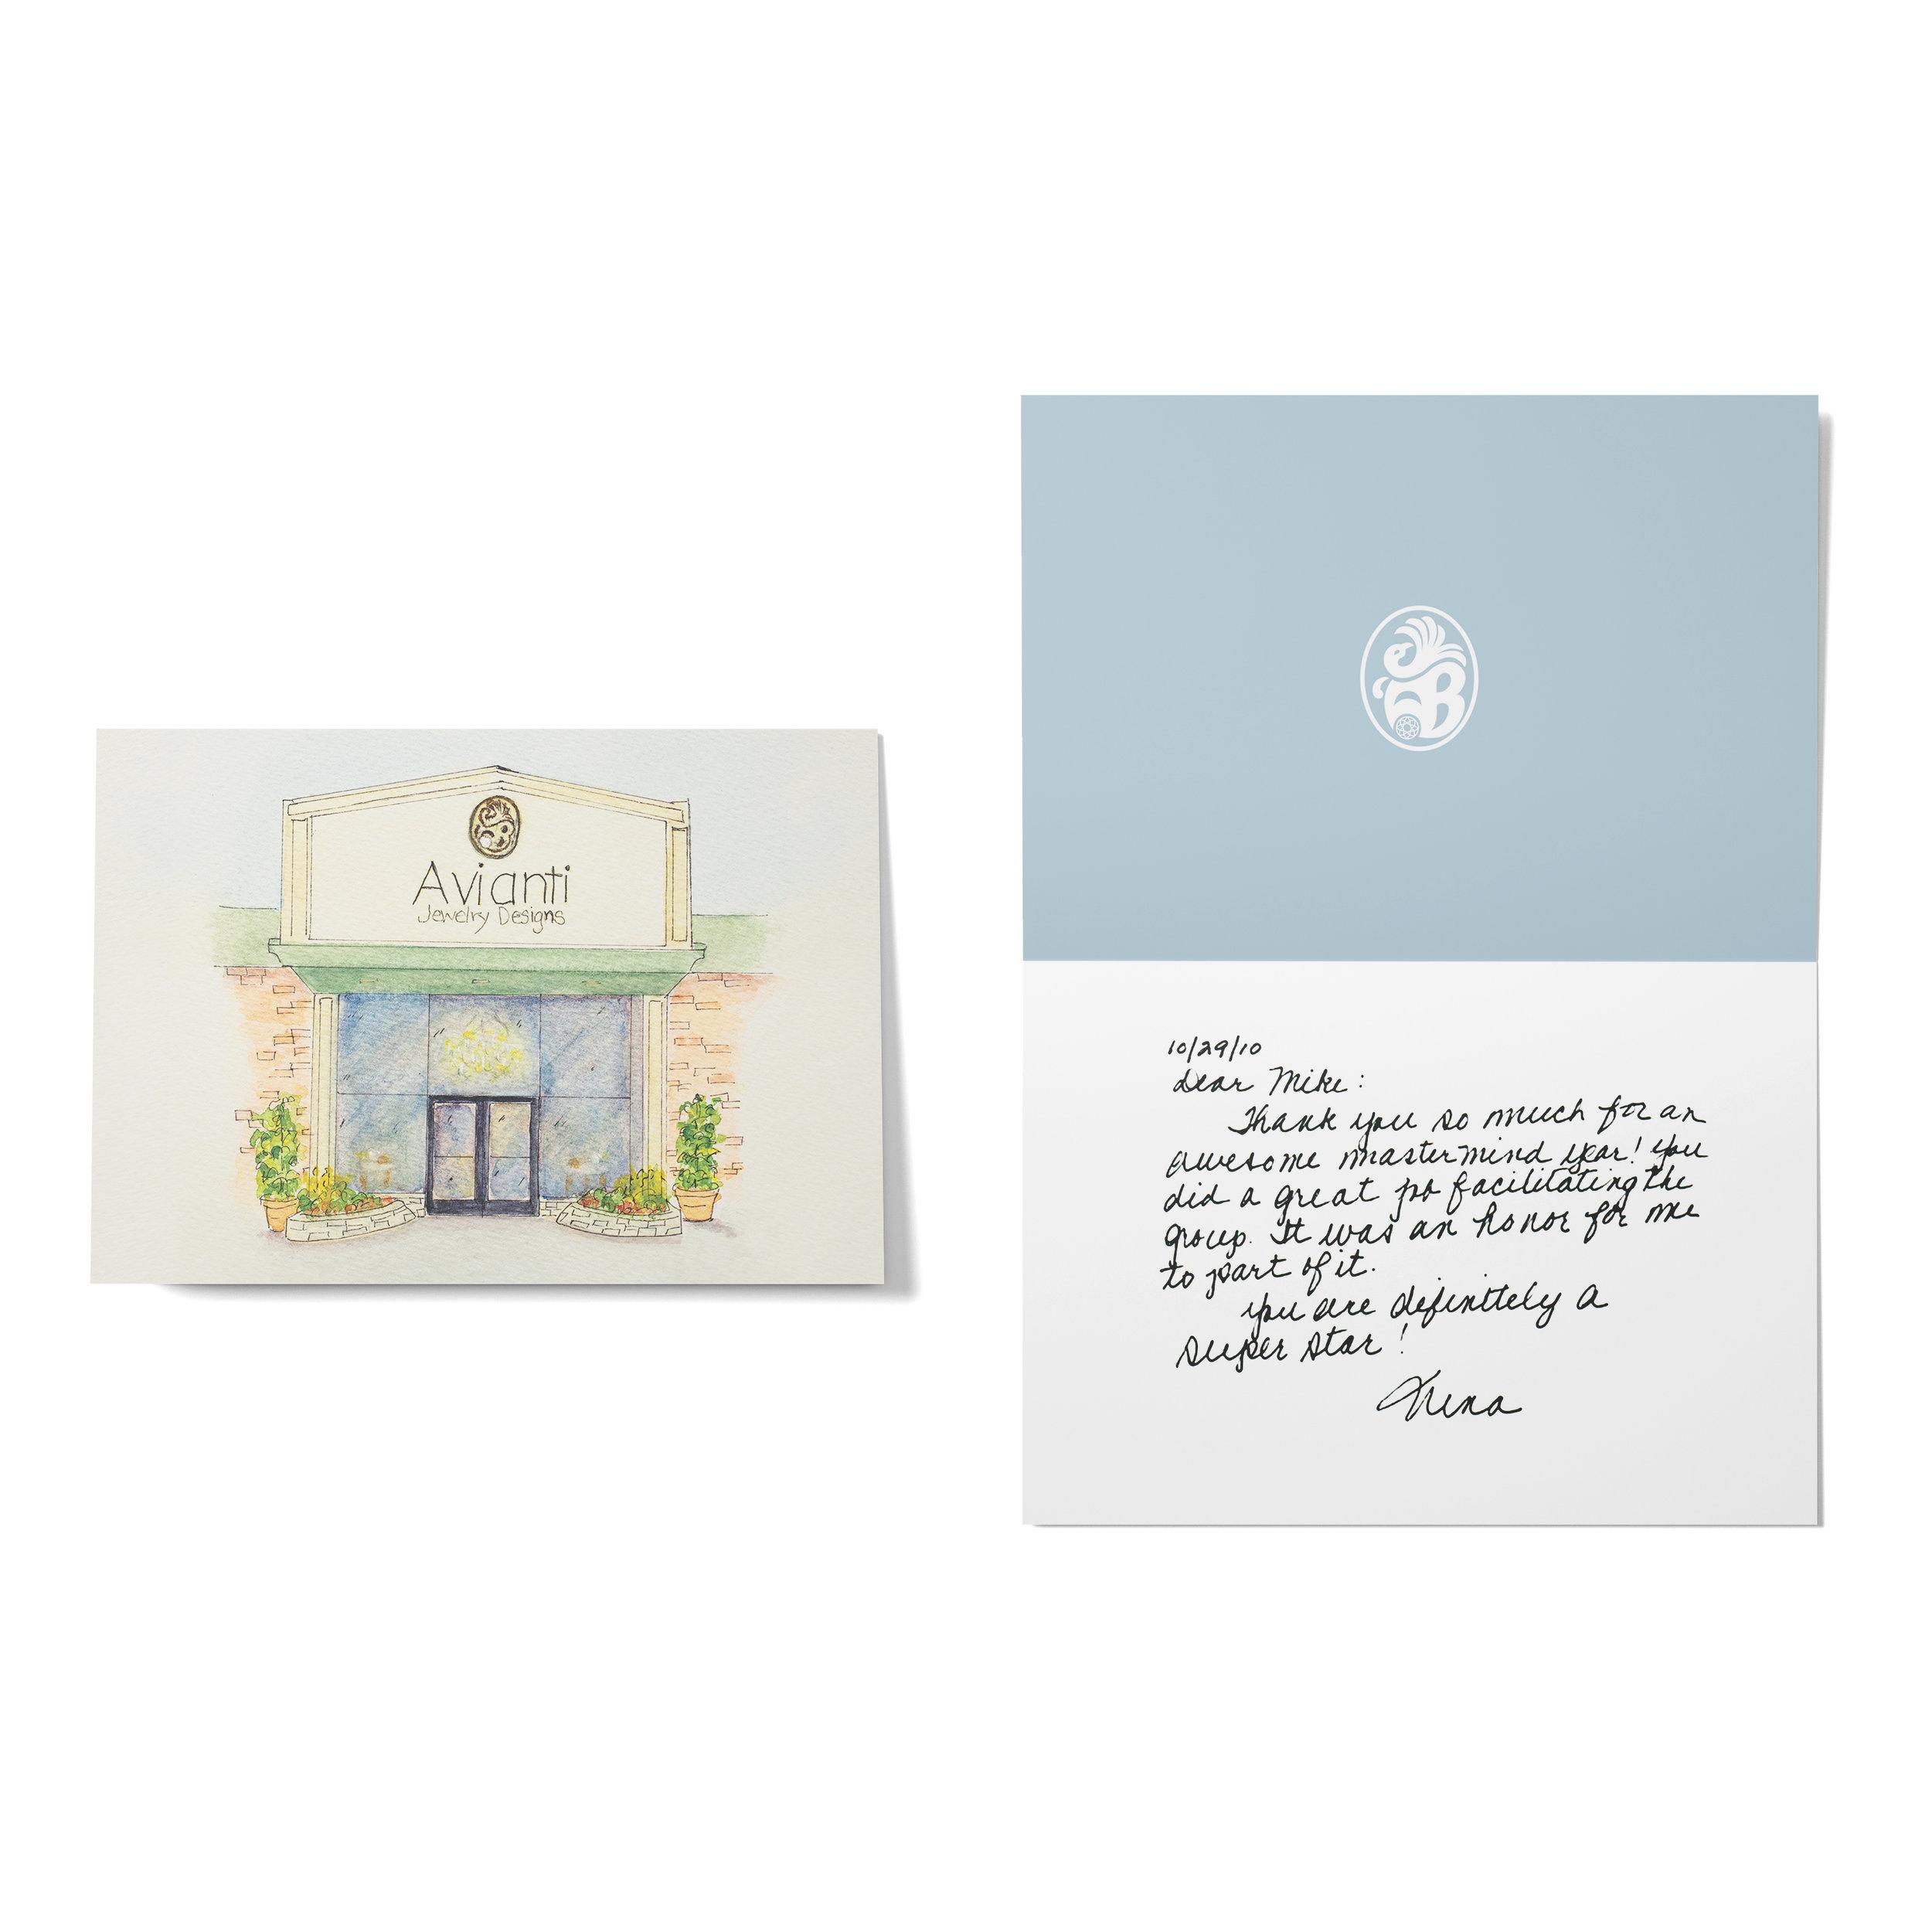 Avianti Jewelry Thank You Card